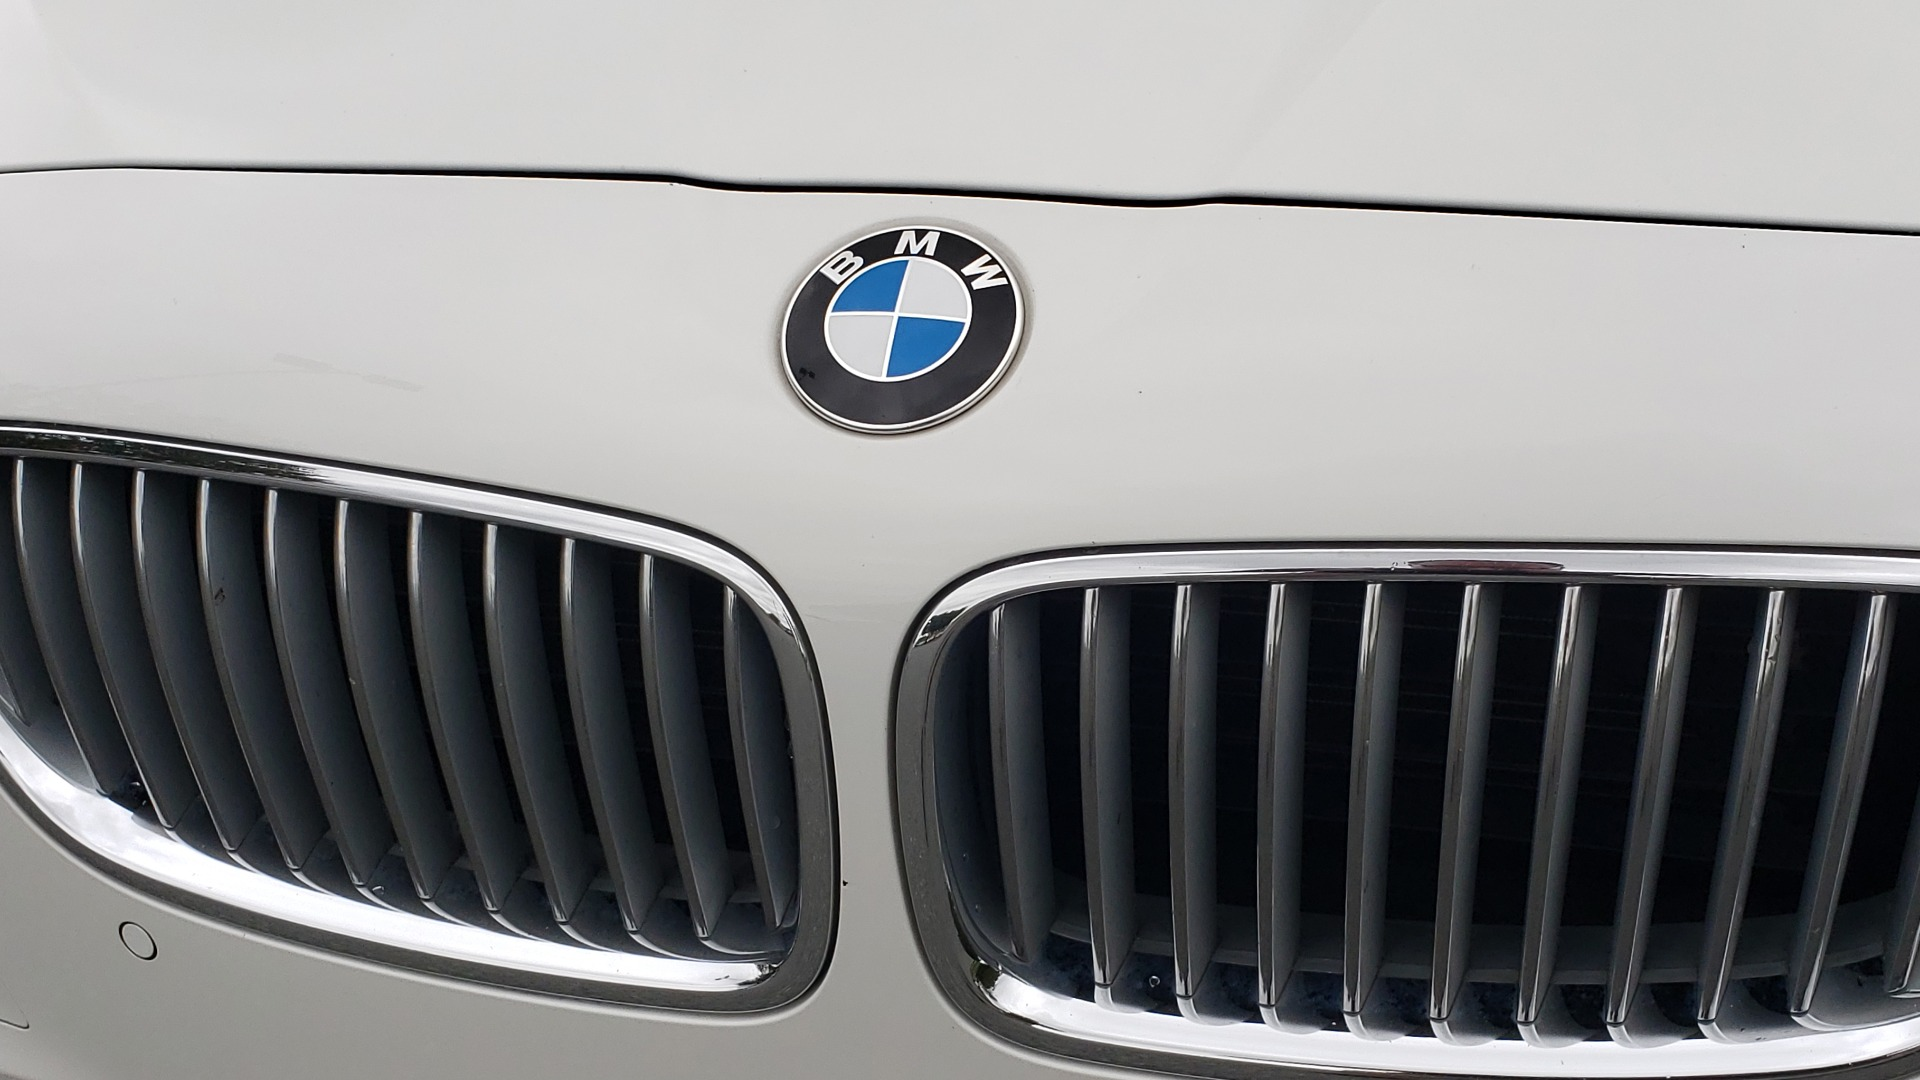 Used 2012 BMW 5 SERIES 550I M SPORT / NAV / CONV PKG / SUNROOF / PREM SND / REARVIEW for sale Sold at Formula Imports in Charlotte NC 28227 20